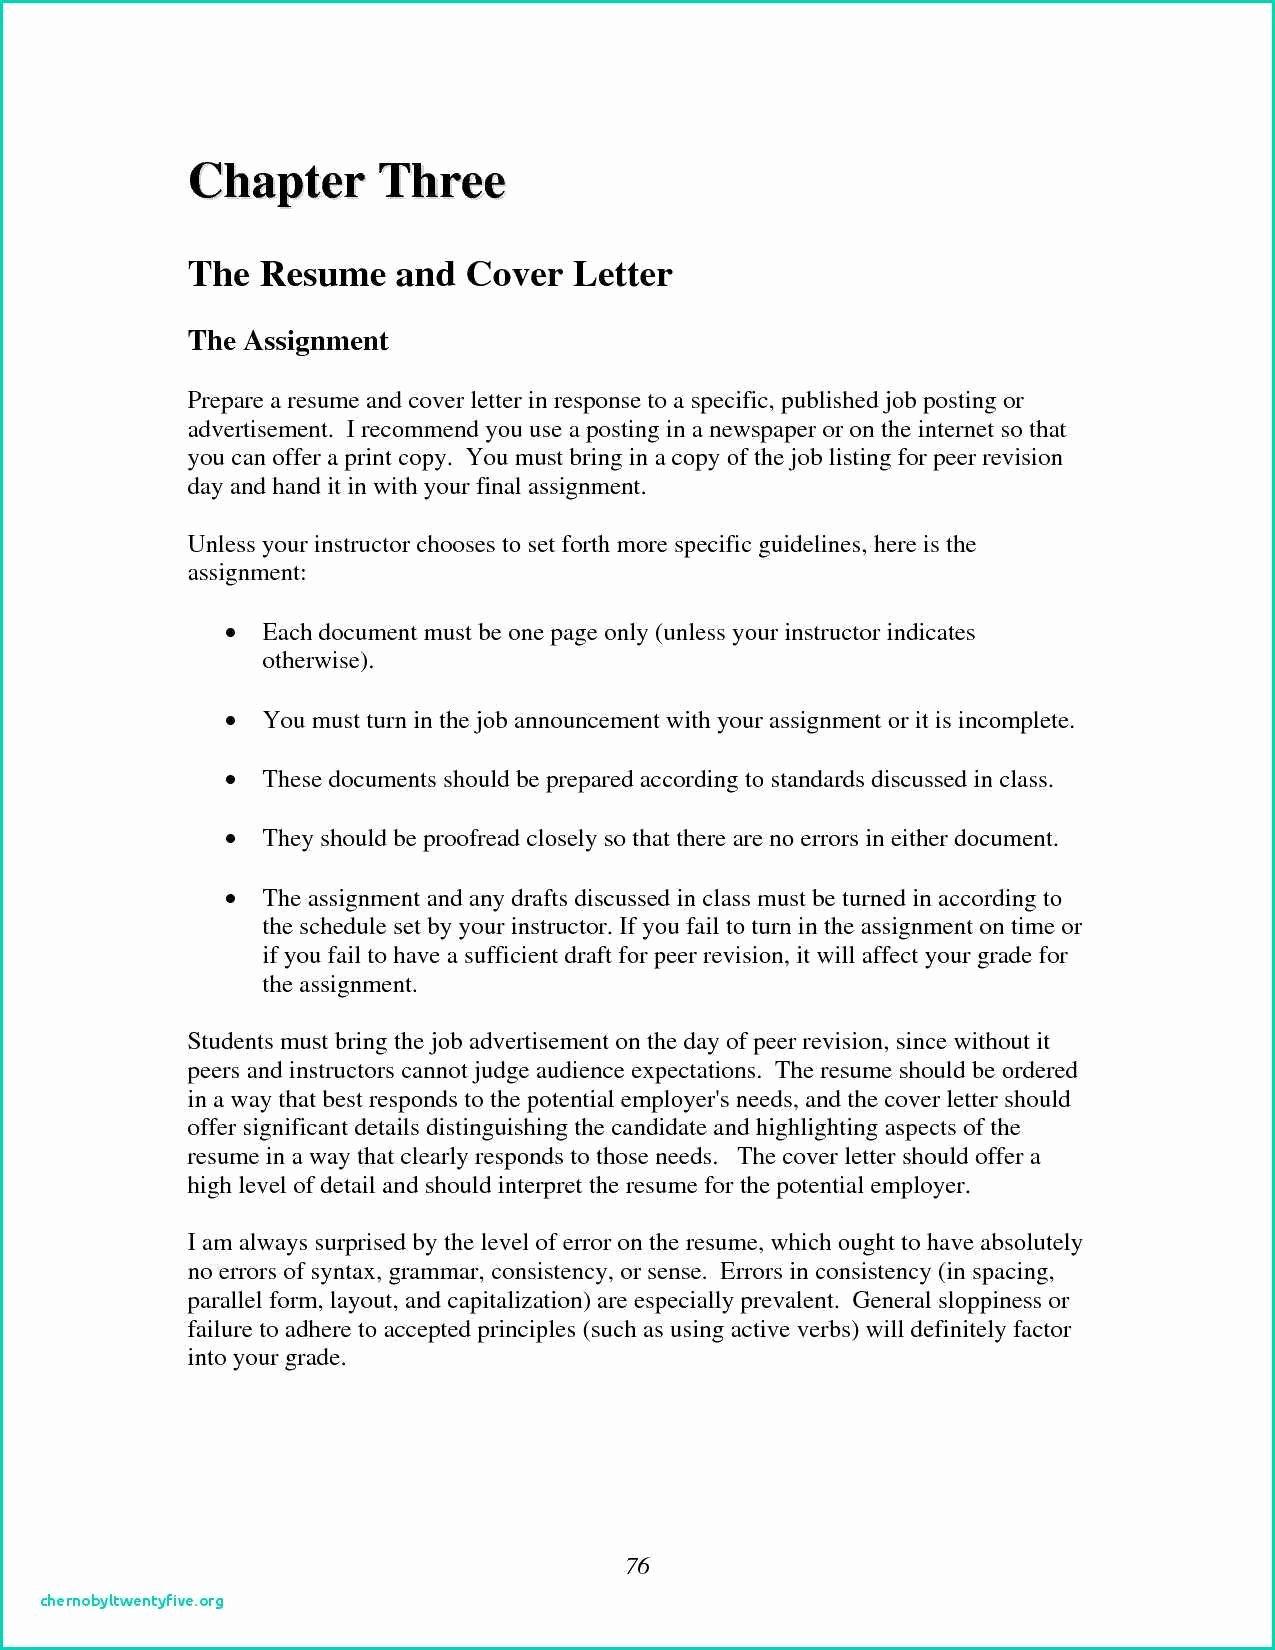 Kairos Retreat Letter Examples Awesome 11 Kairos Letter Examples